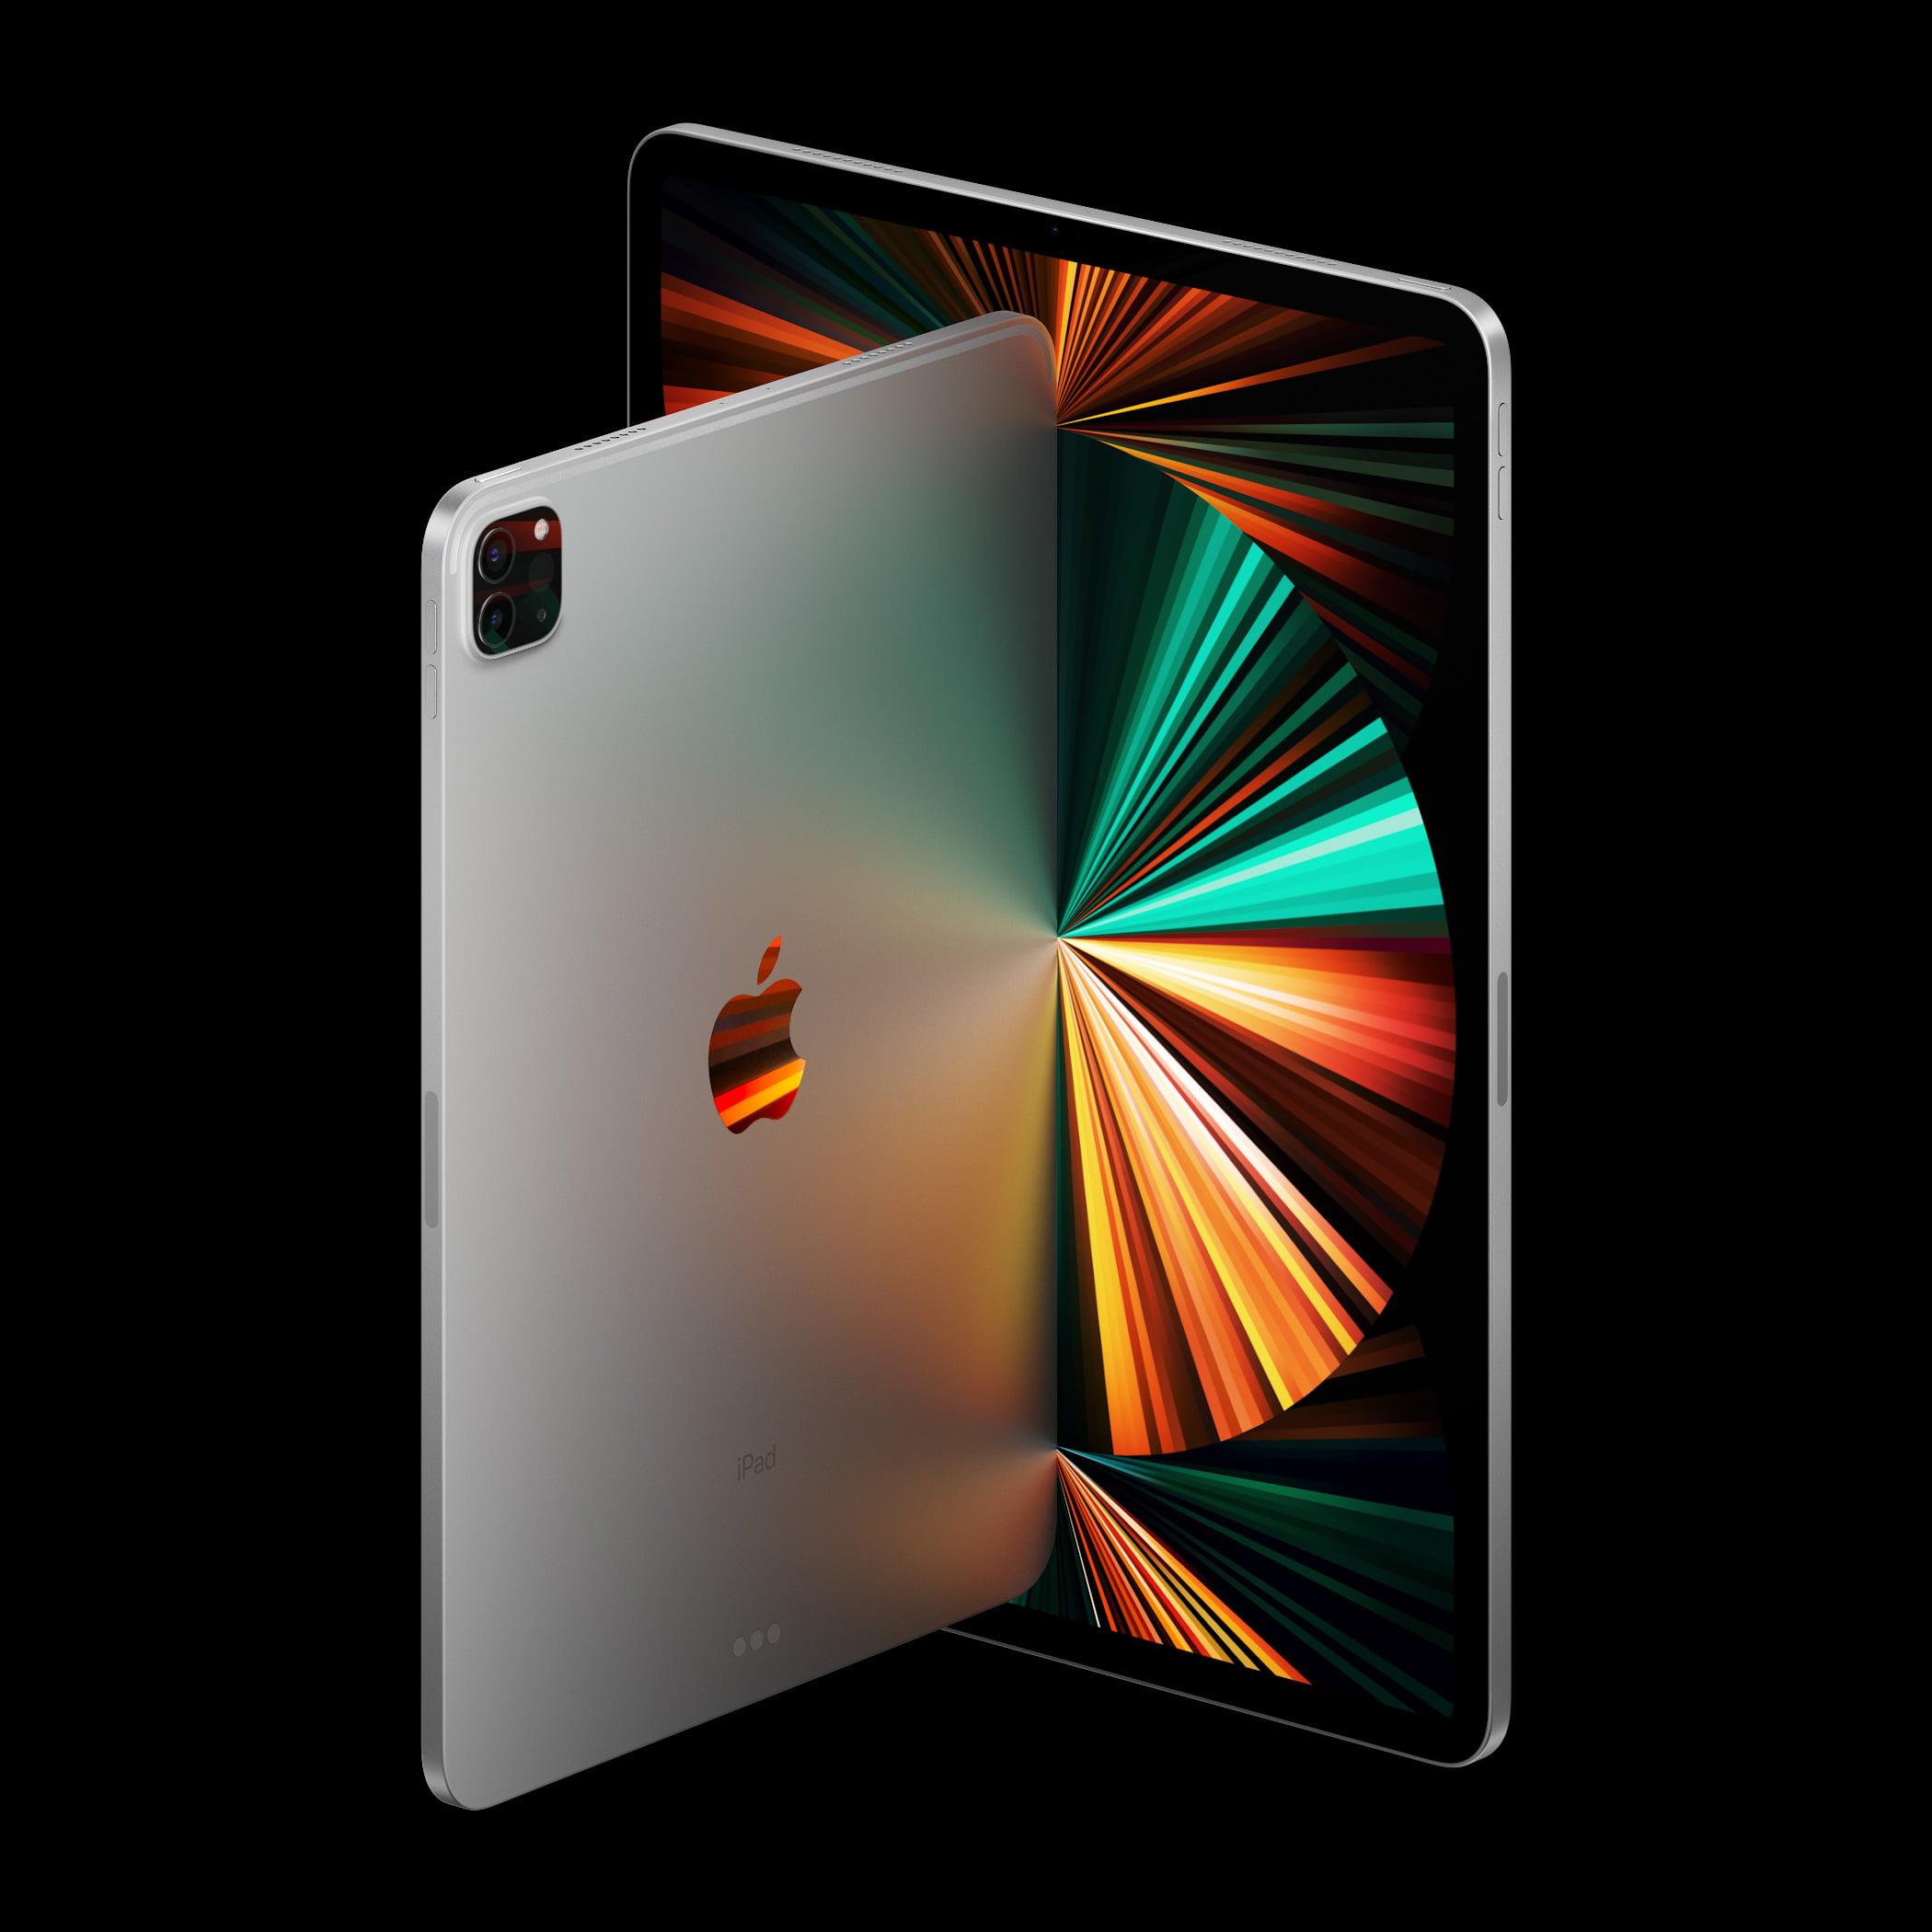 M1 Apple iPad Pro